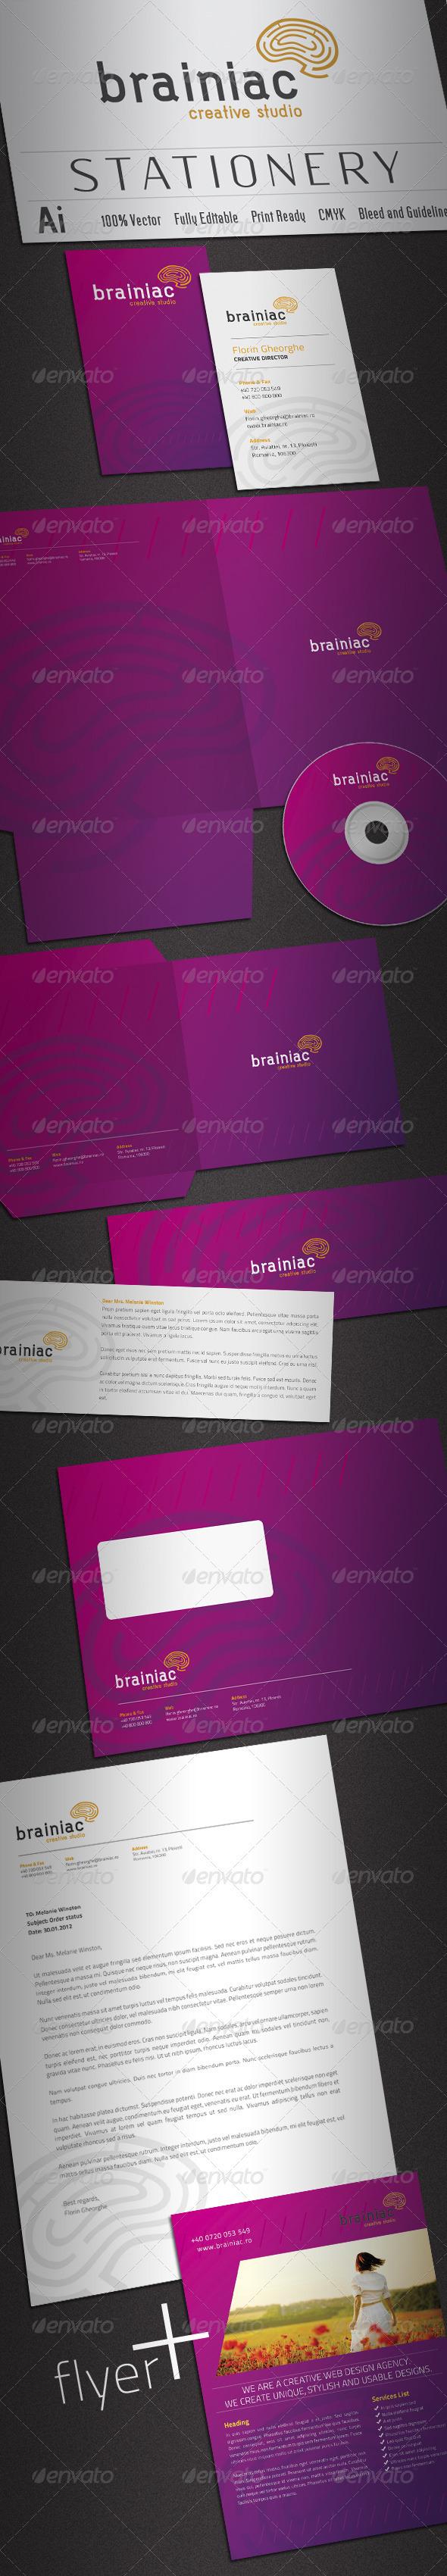 Brainiac Stationery - Stationery Print Templates